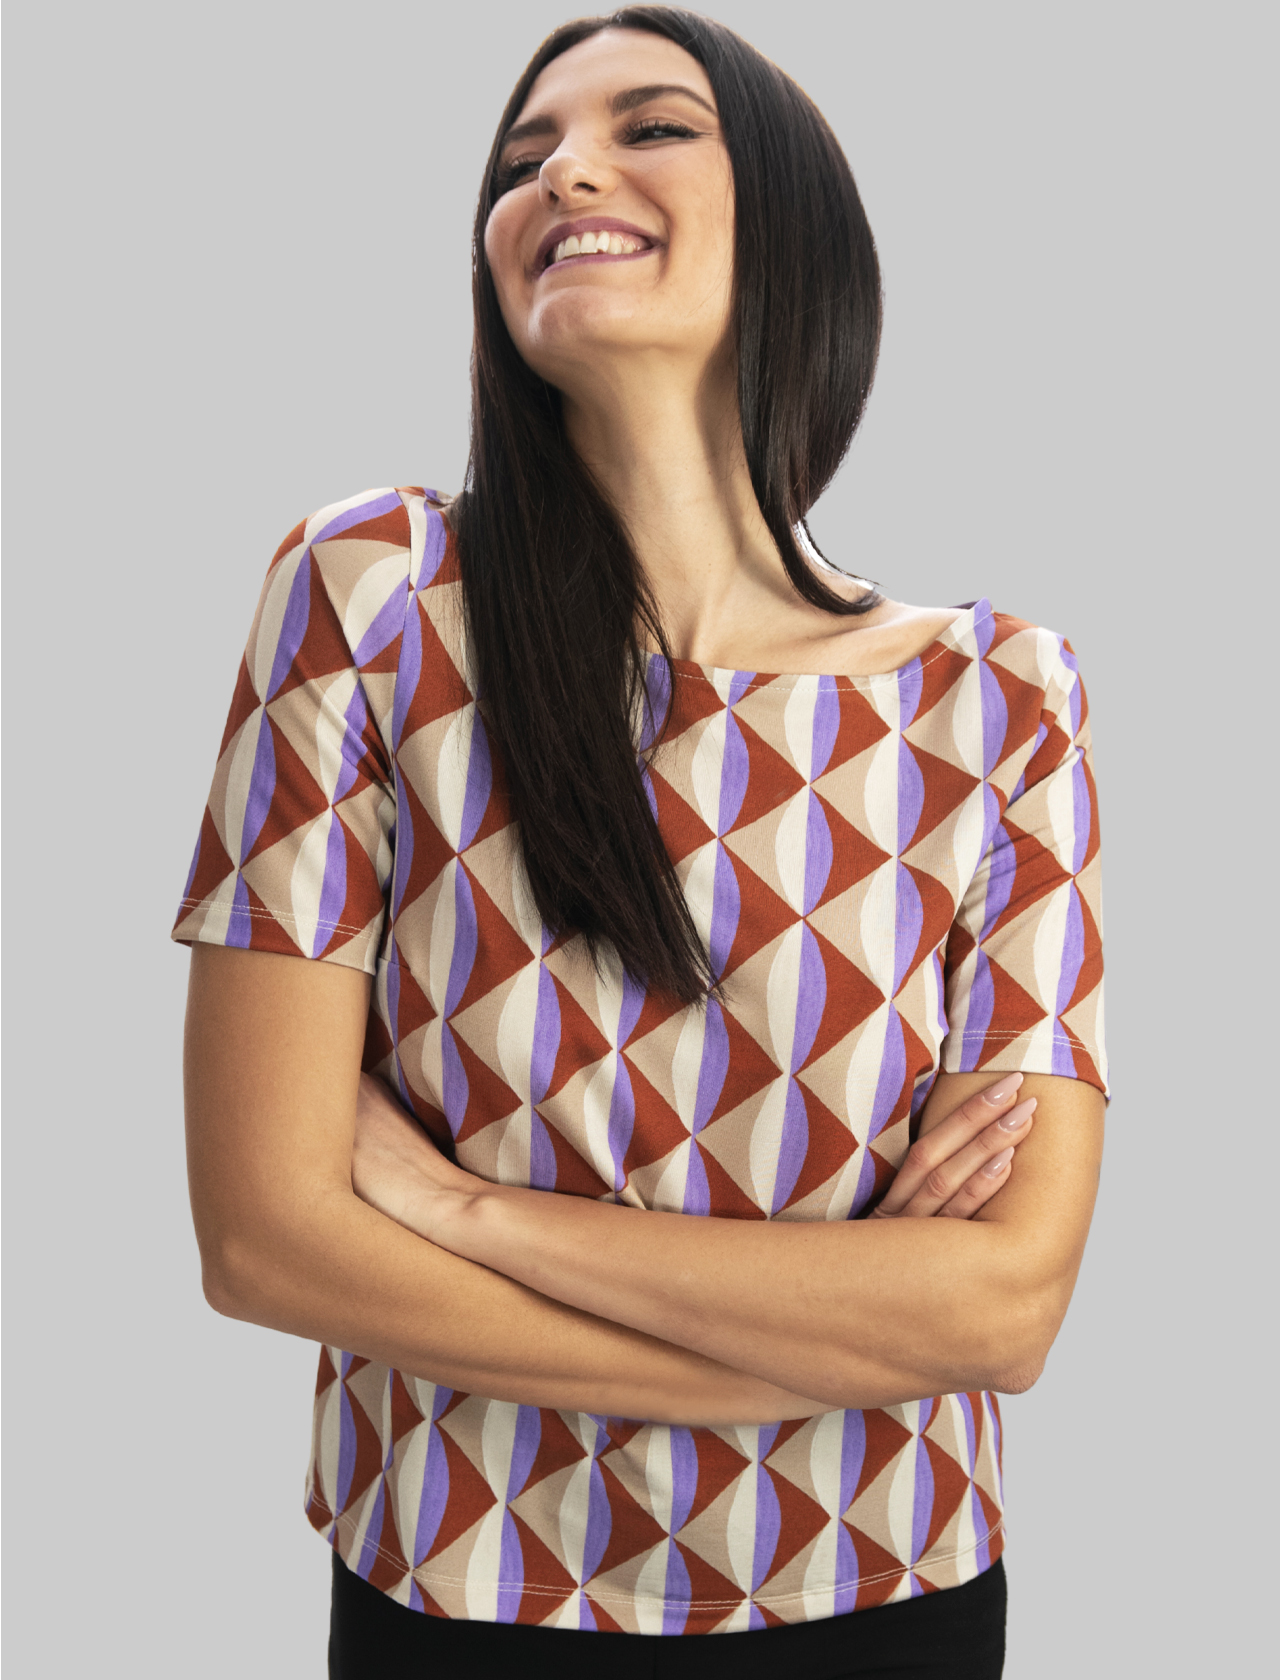 Women's Clothing T-shirt Jersey Symmetria Natural Boat Neck and Fantasy Mauve Maliparmi | T-shirts and Tops | JK018370496B1106